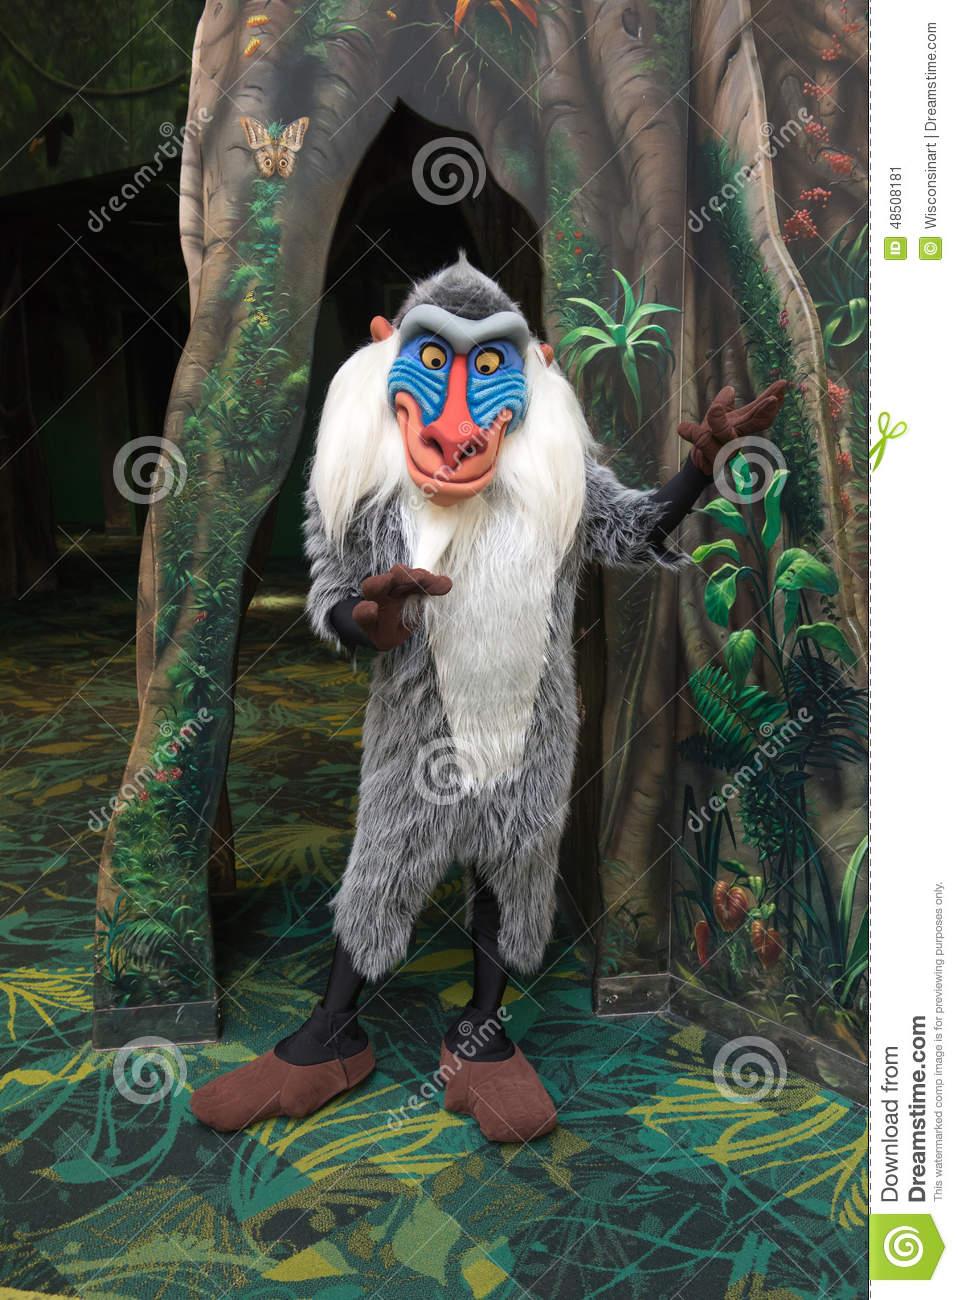 Disney character tourist clipart. Clipartfox world animal kingdom